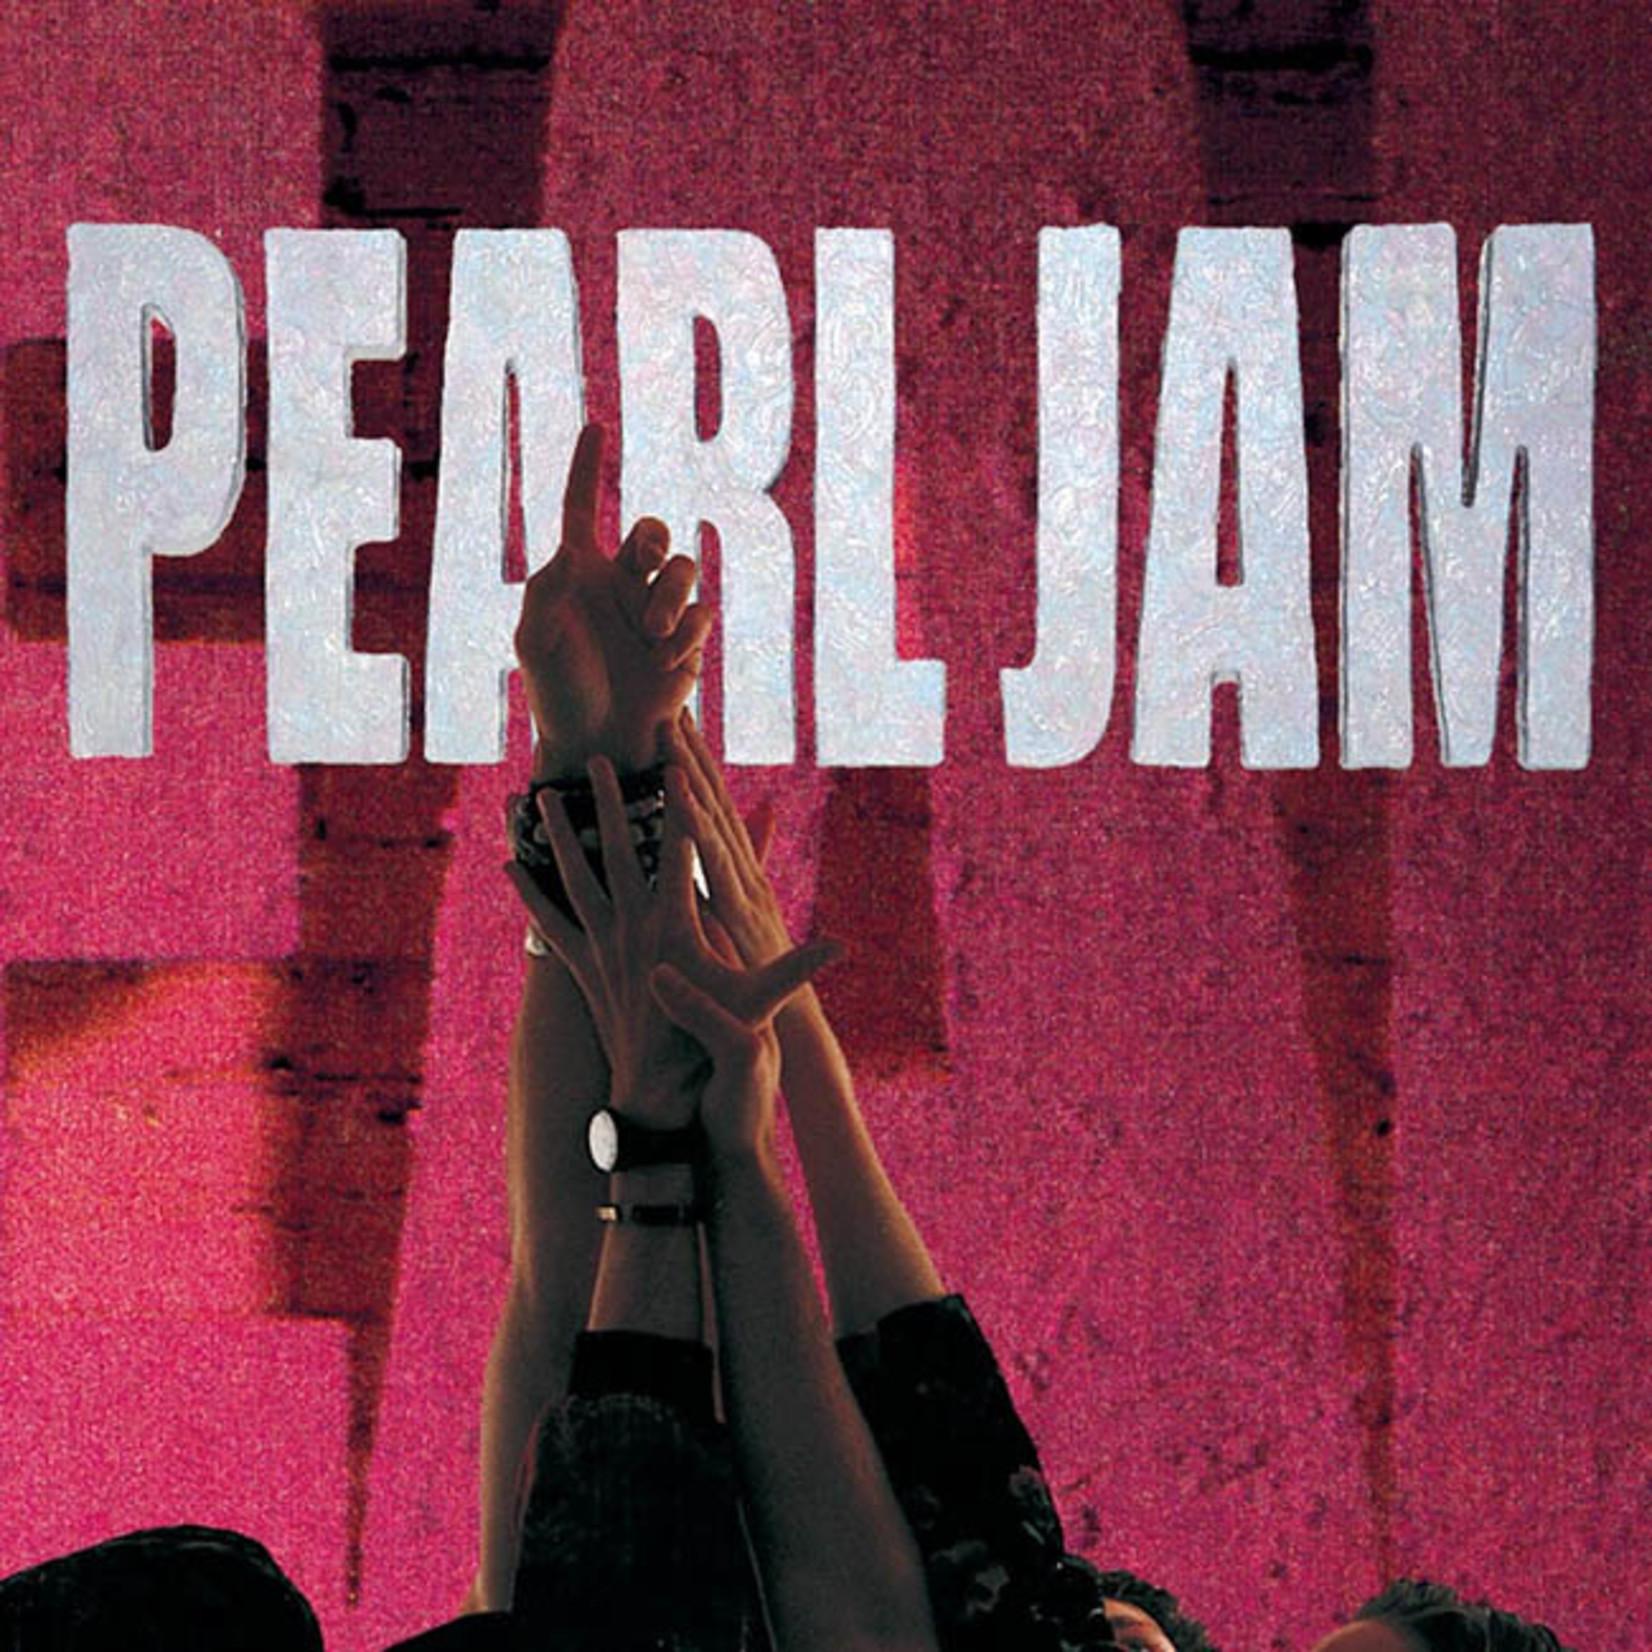 [New] Pearl Jam: Ten